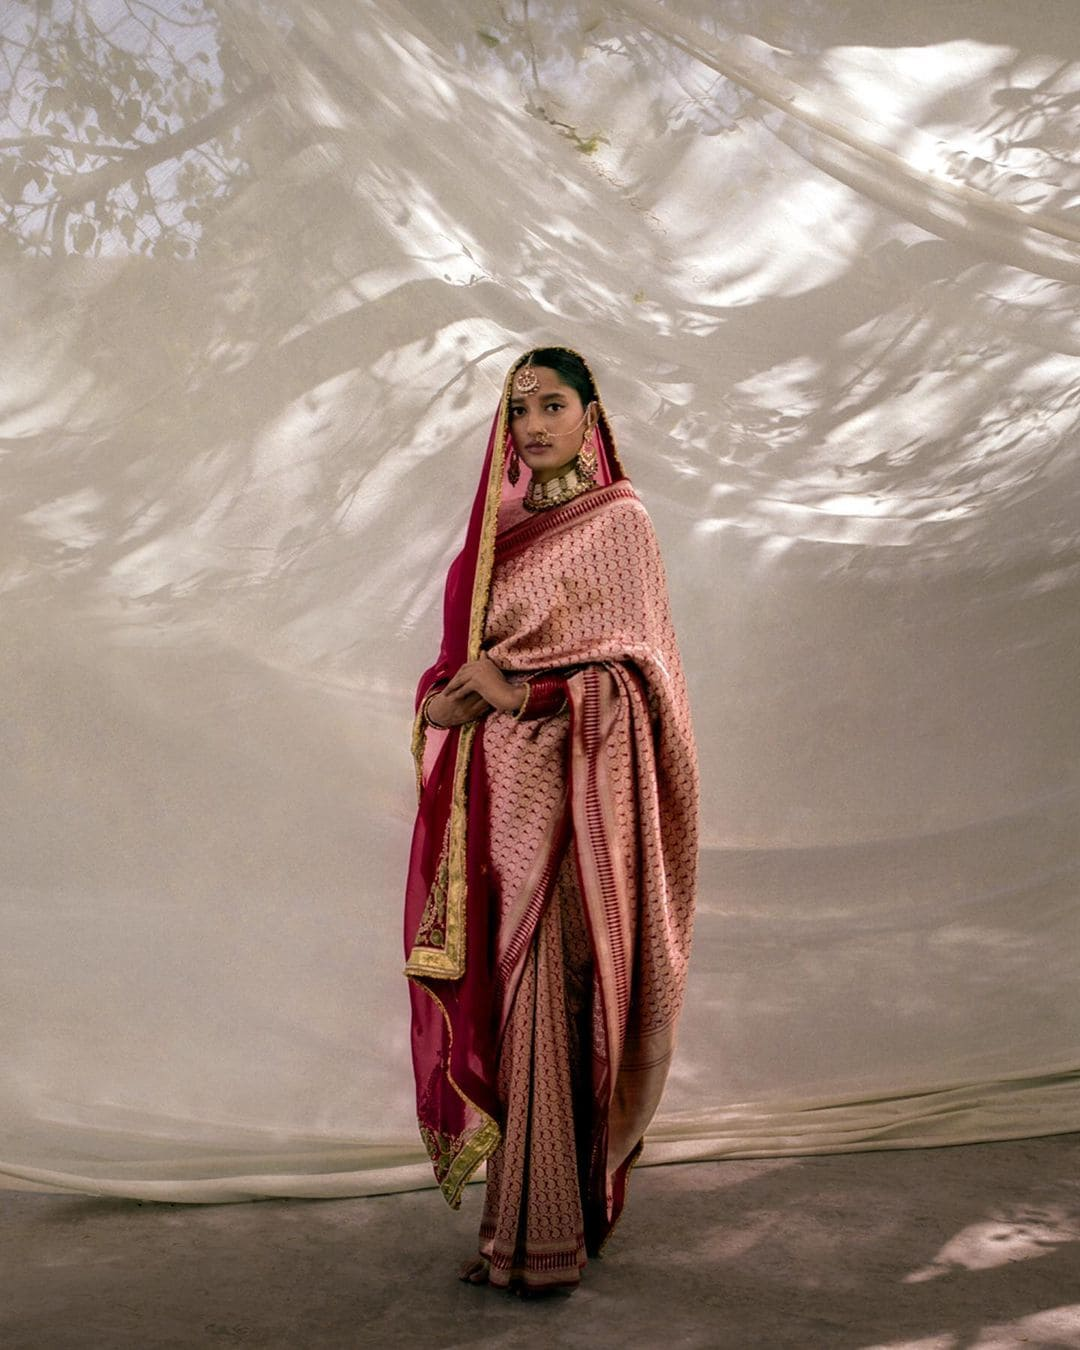 Model wearing a Varanasi silk brocade 'Amvi' sari with all-over jaal (lattice) of paisley motifs.